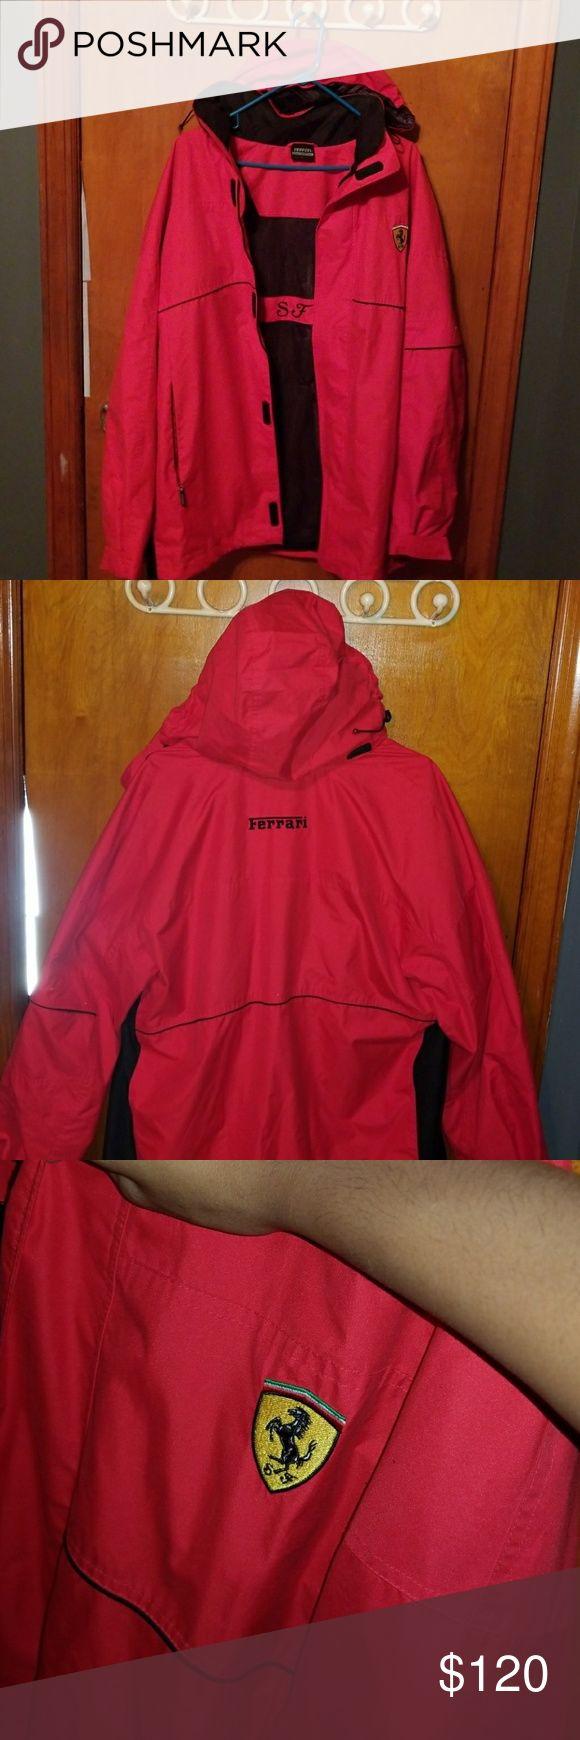 Red Ferrari Jacket w/ hood Size Large Thick windbreaker jacket Worn twice  Some wear on the inside Big discount off of original price. Ferrari Jackets & Coats